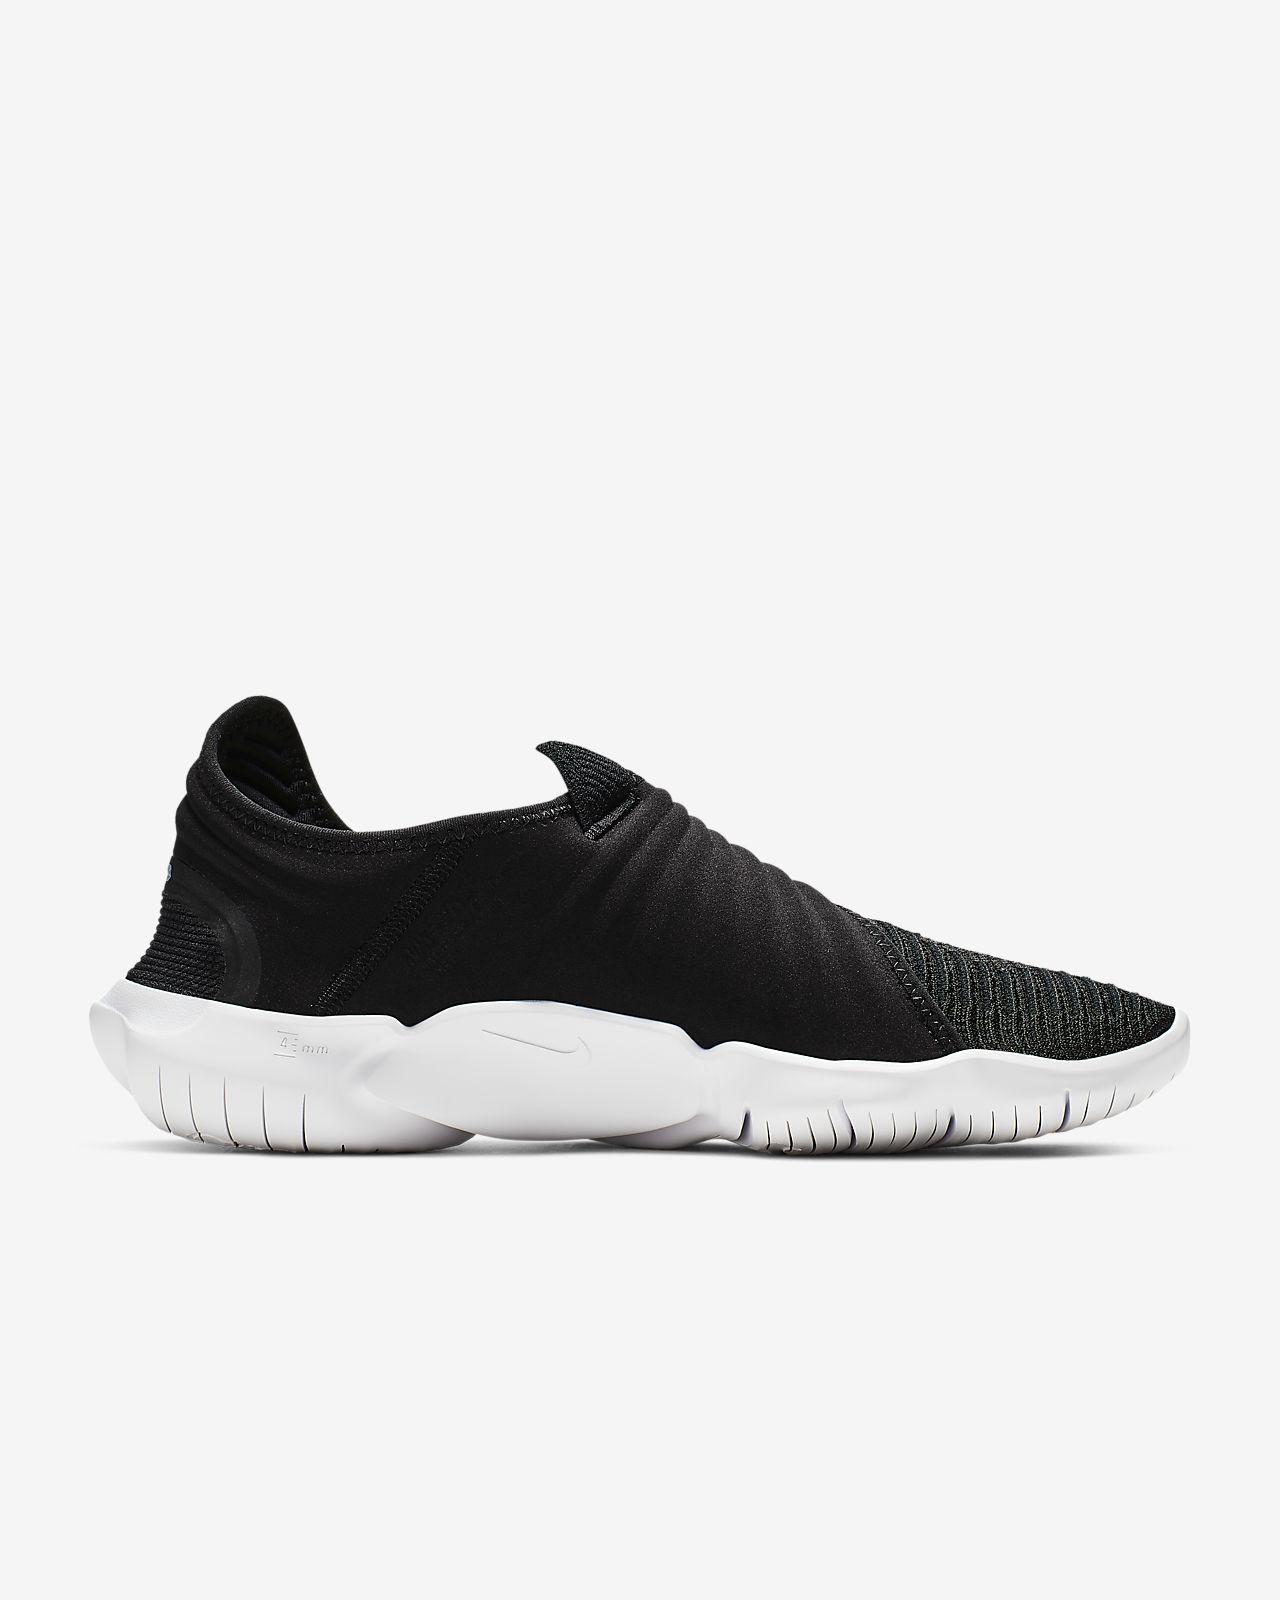 b65473bd301dd1 Nike Free RN Flyknit 3.0 Herren-Laufschuh. Nike.com LU